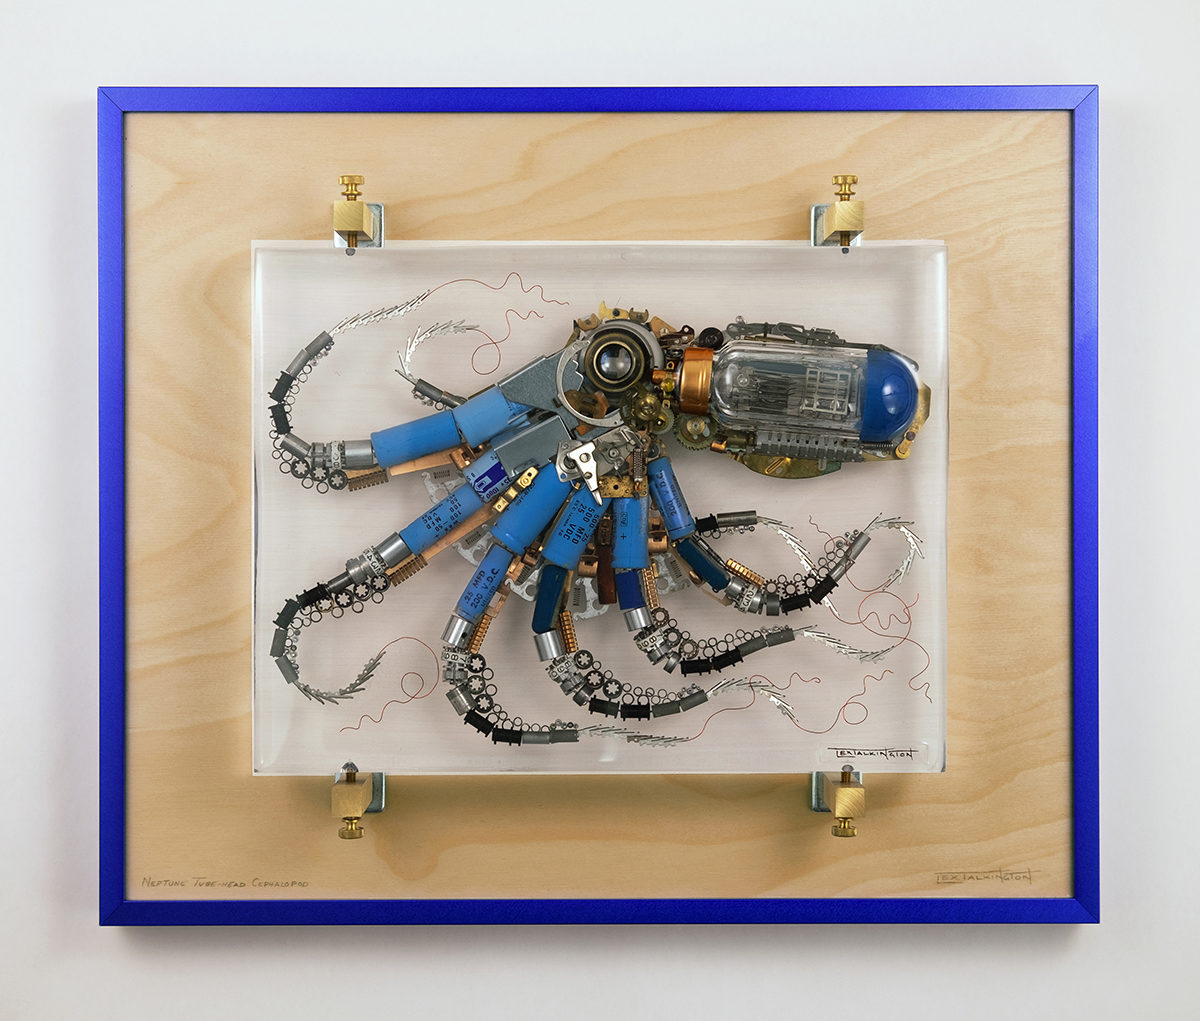 lex talkington octopus sculpture